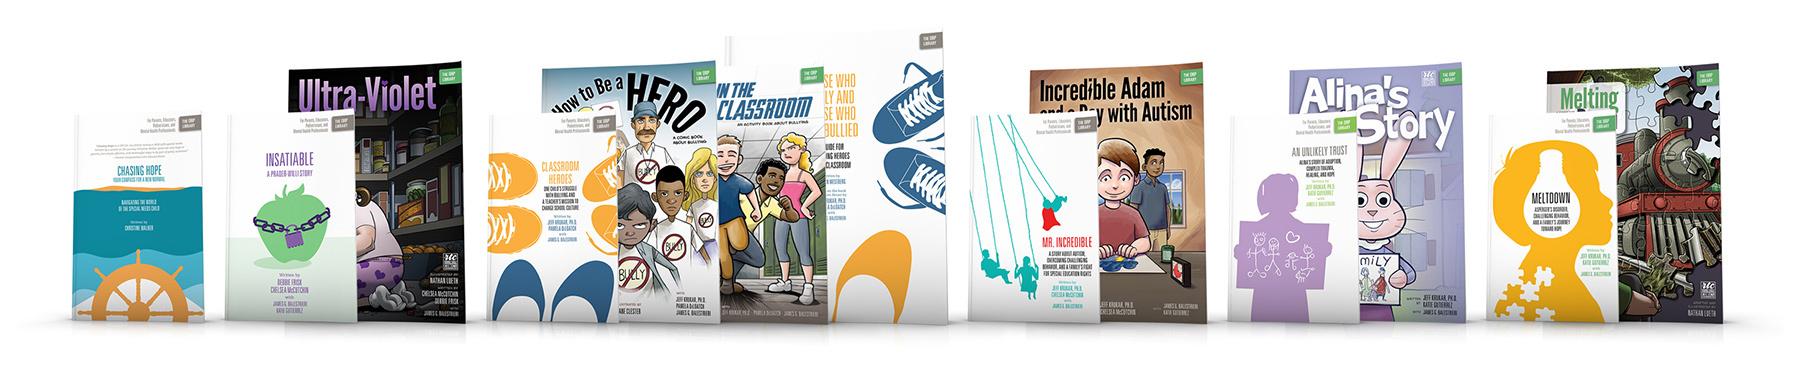 Packaging, Publishing & Printing